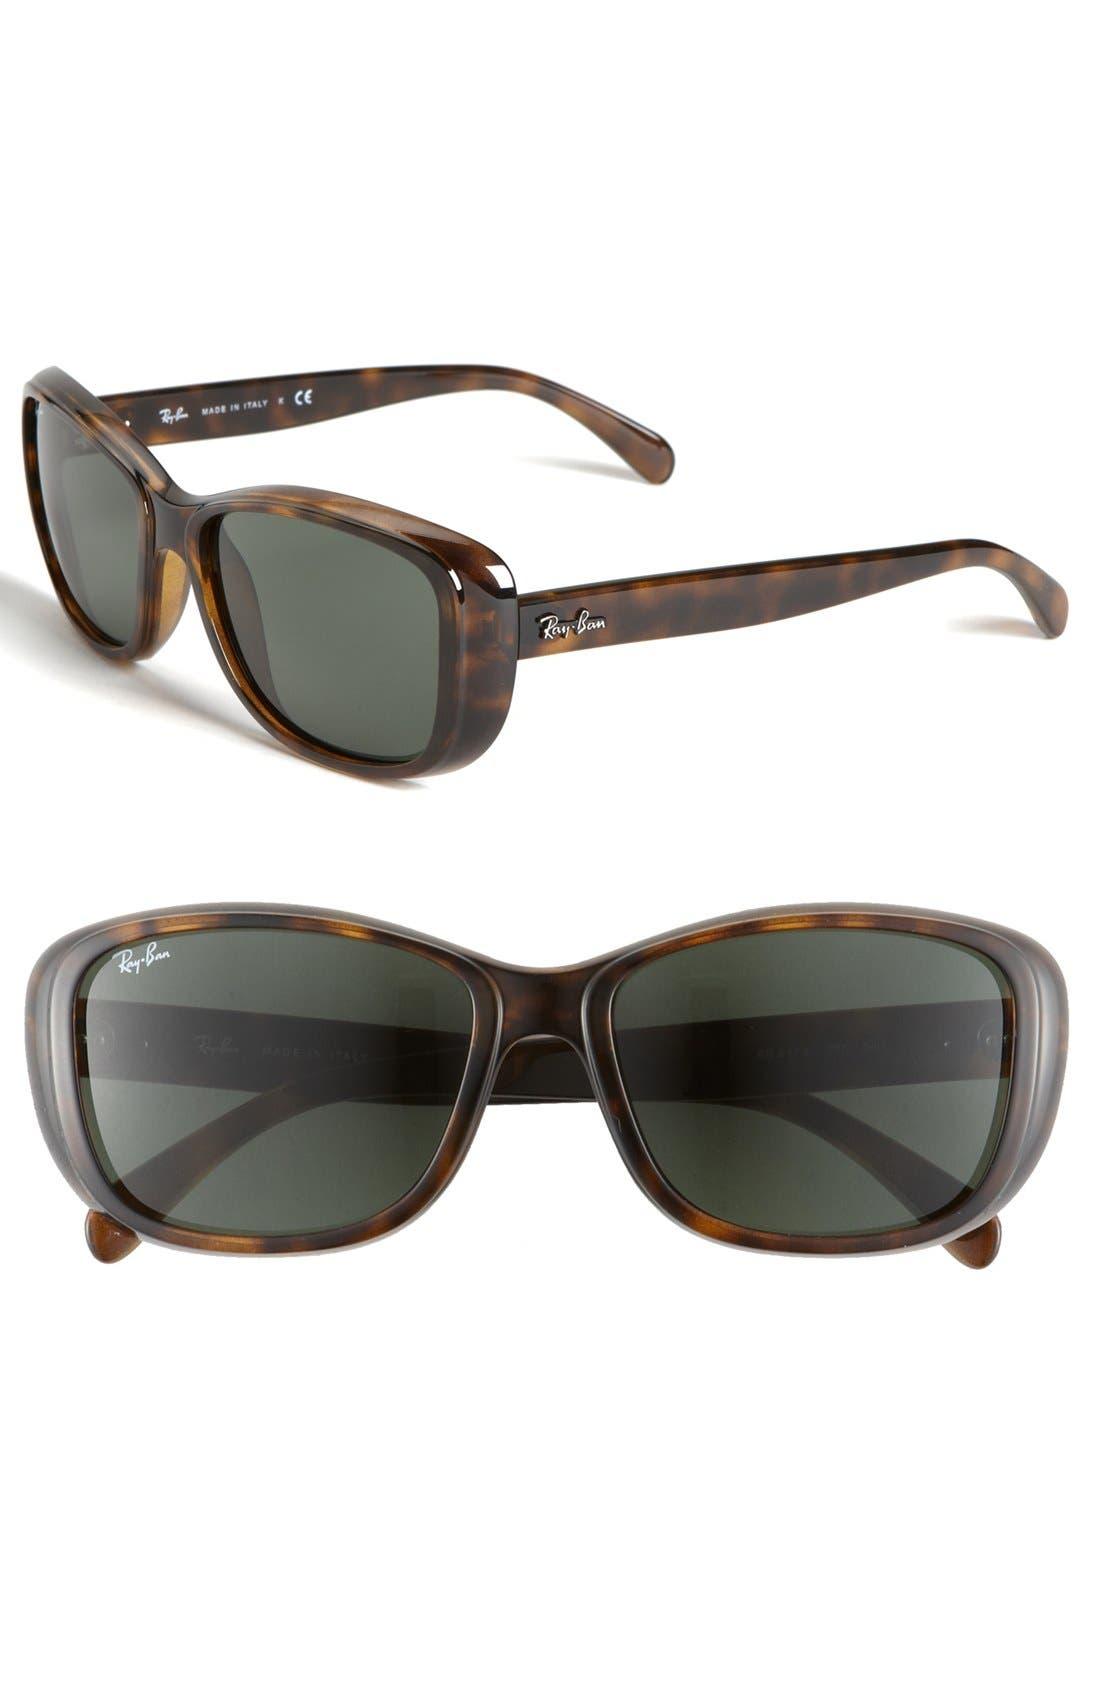 Main Image - Ray-Ban 'Classic' 56mm Polarized Sunglasses